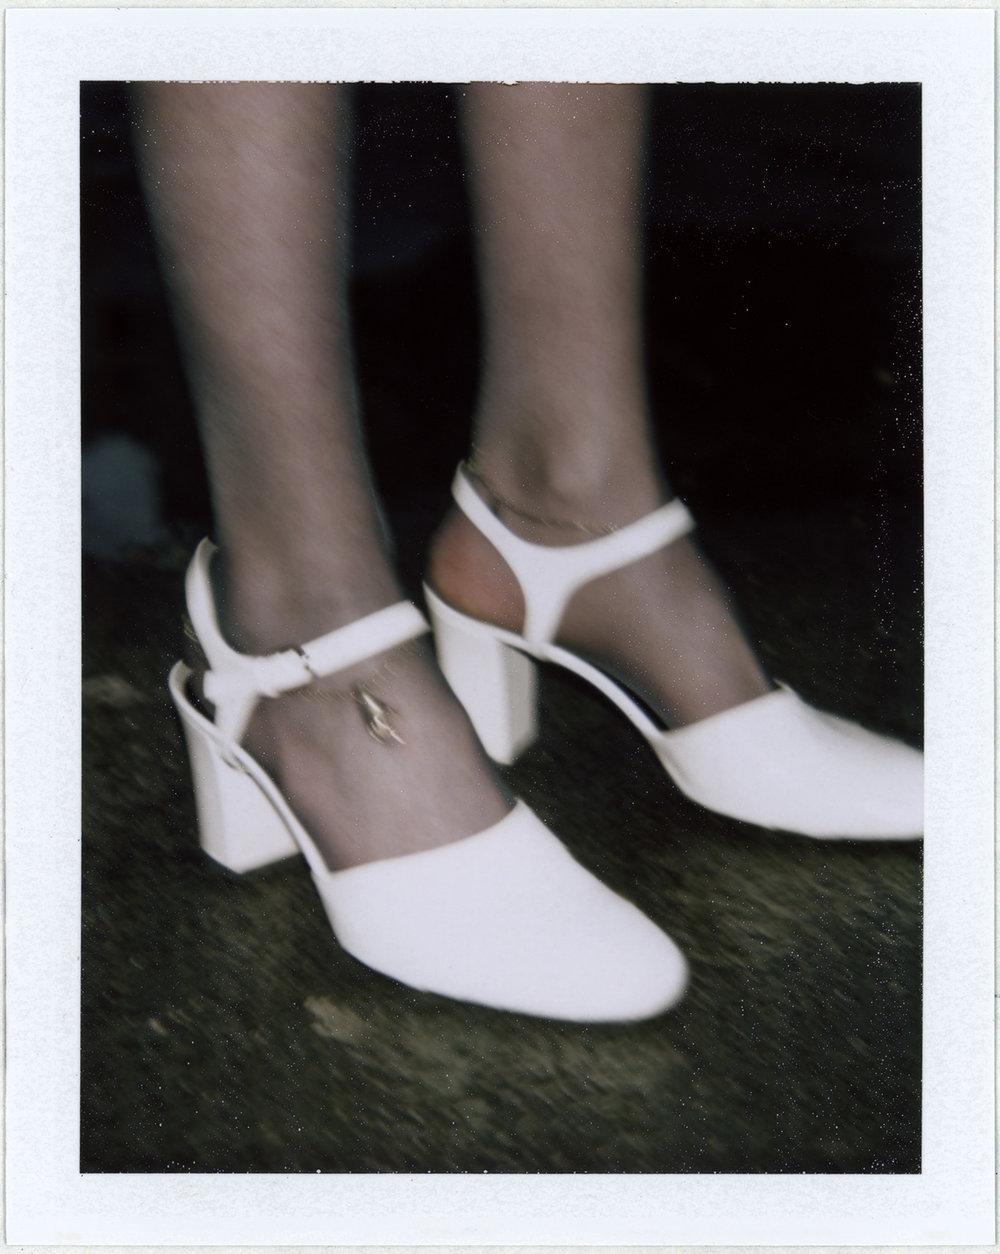 Zapato de JIL SANDER y brazalete de LADY GREY